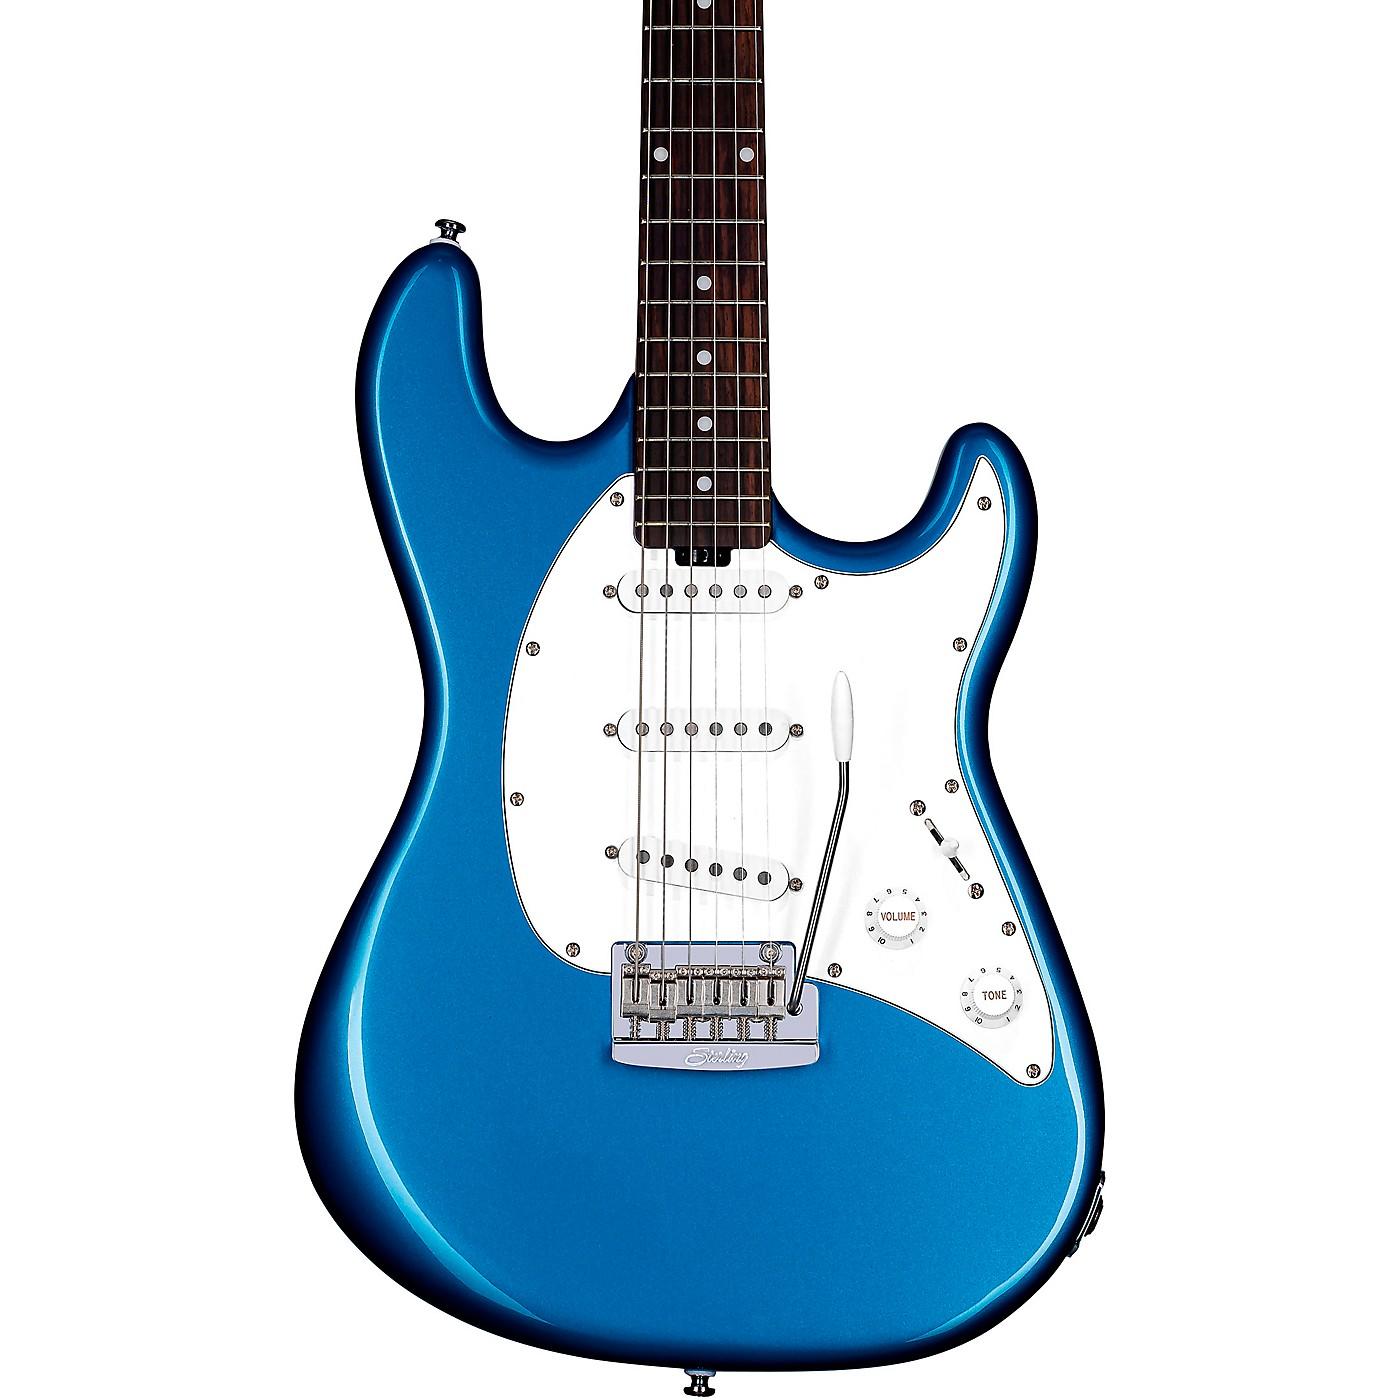 Sterling by Music Man Cutlass SSS Electric Guitar thumbnail